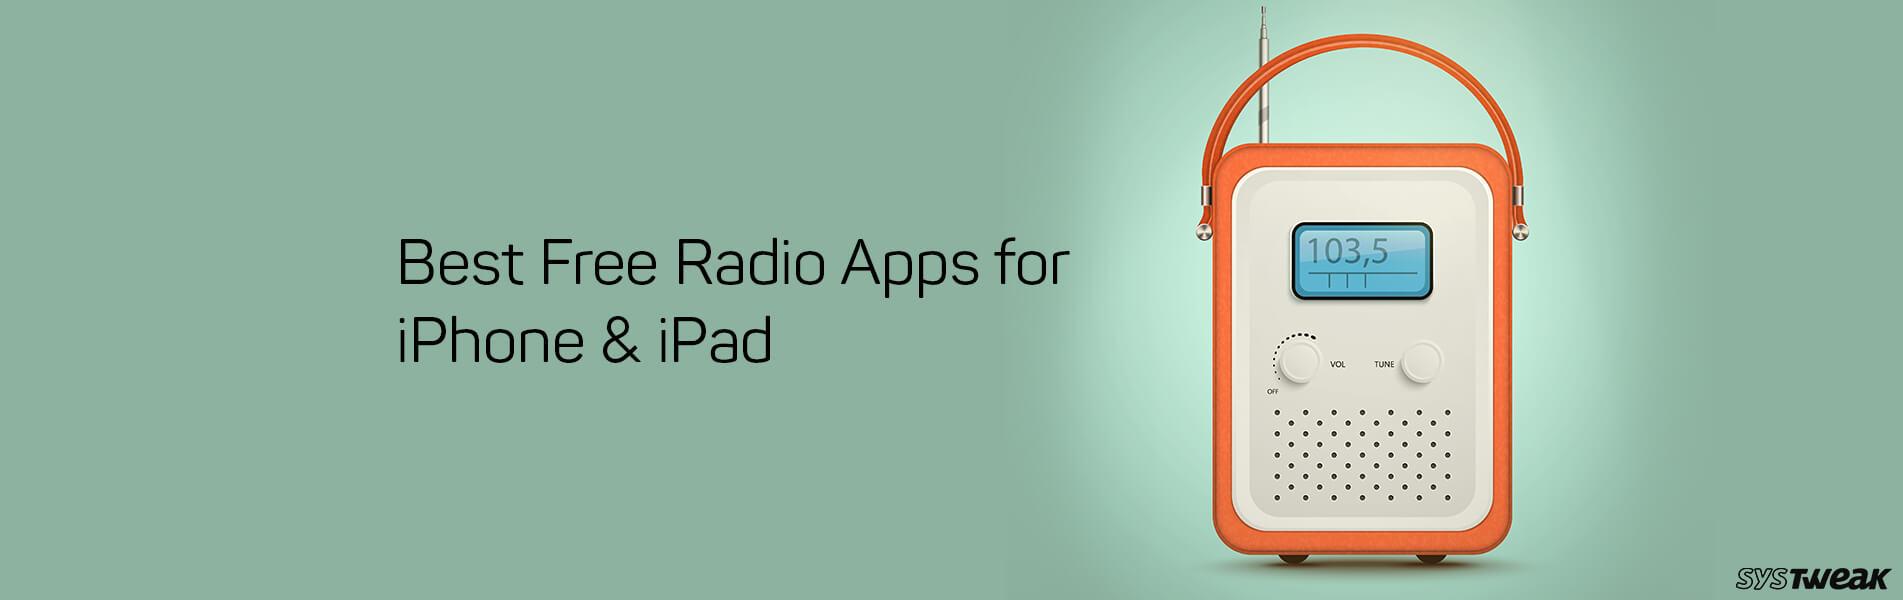 Best Free Radio Apps For iPhone & iPad